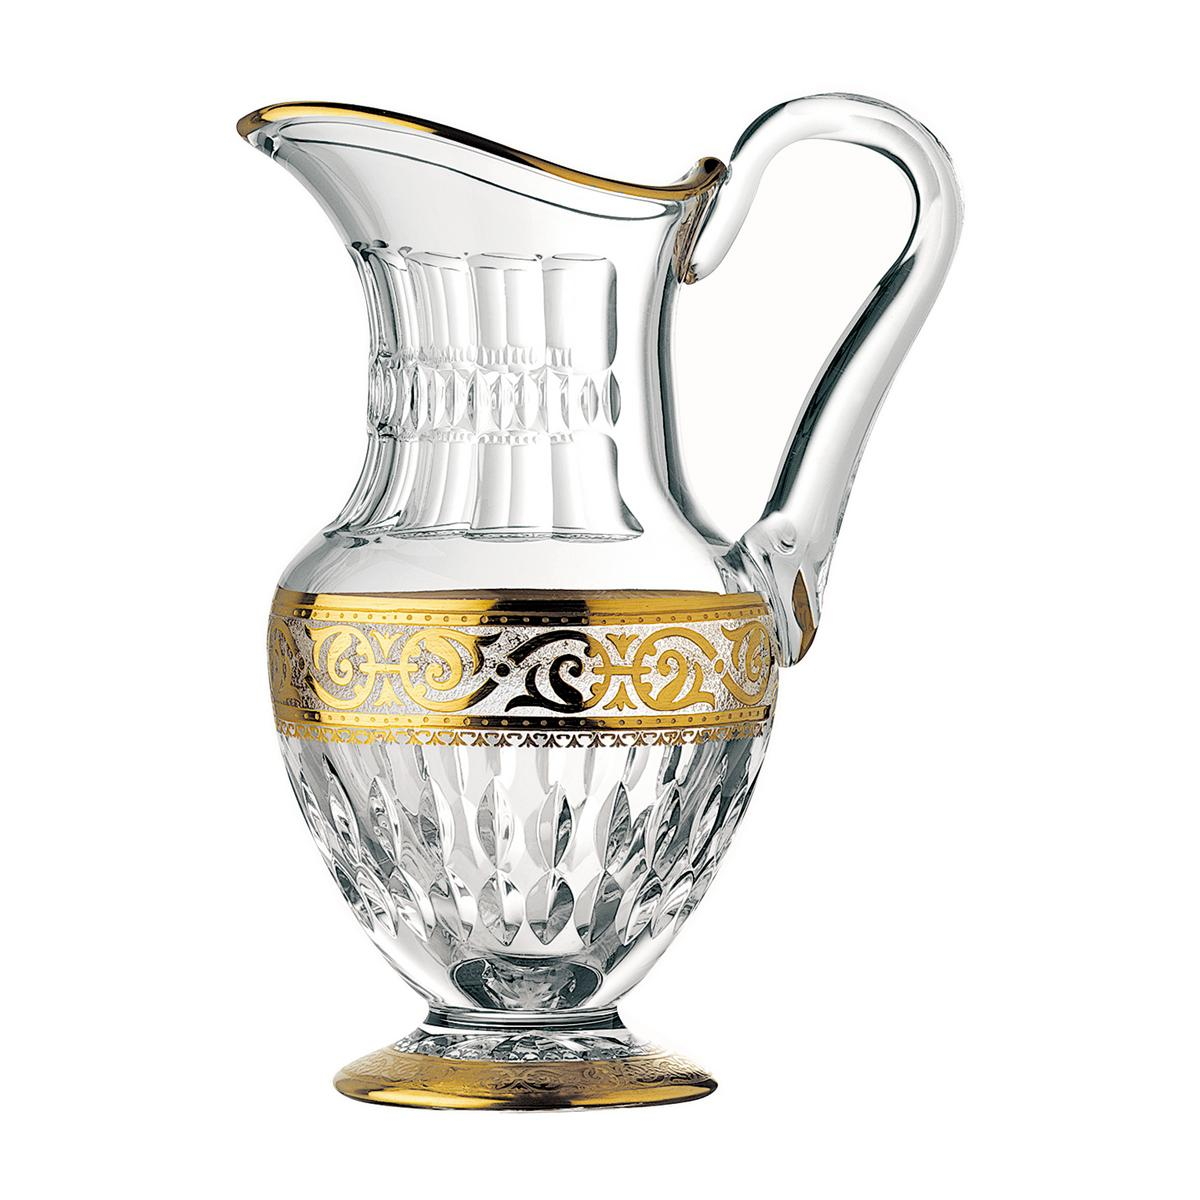 Home Decor St Louis Mo: Saint-Louis Stella Decor Gold Water Jug